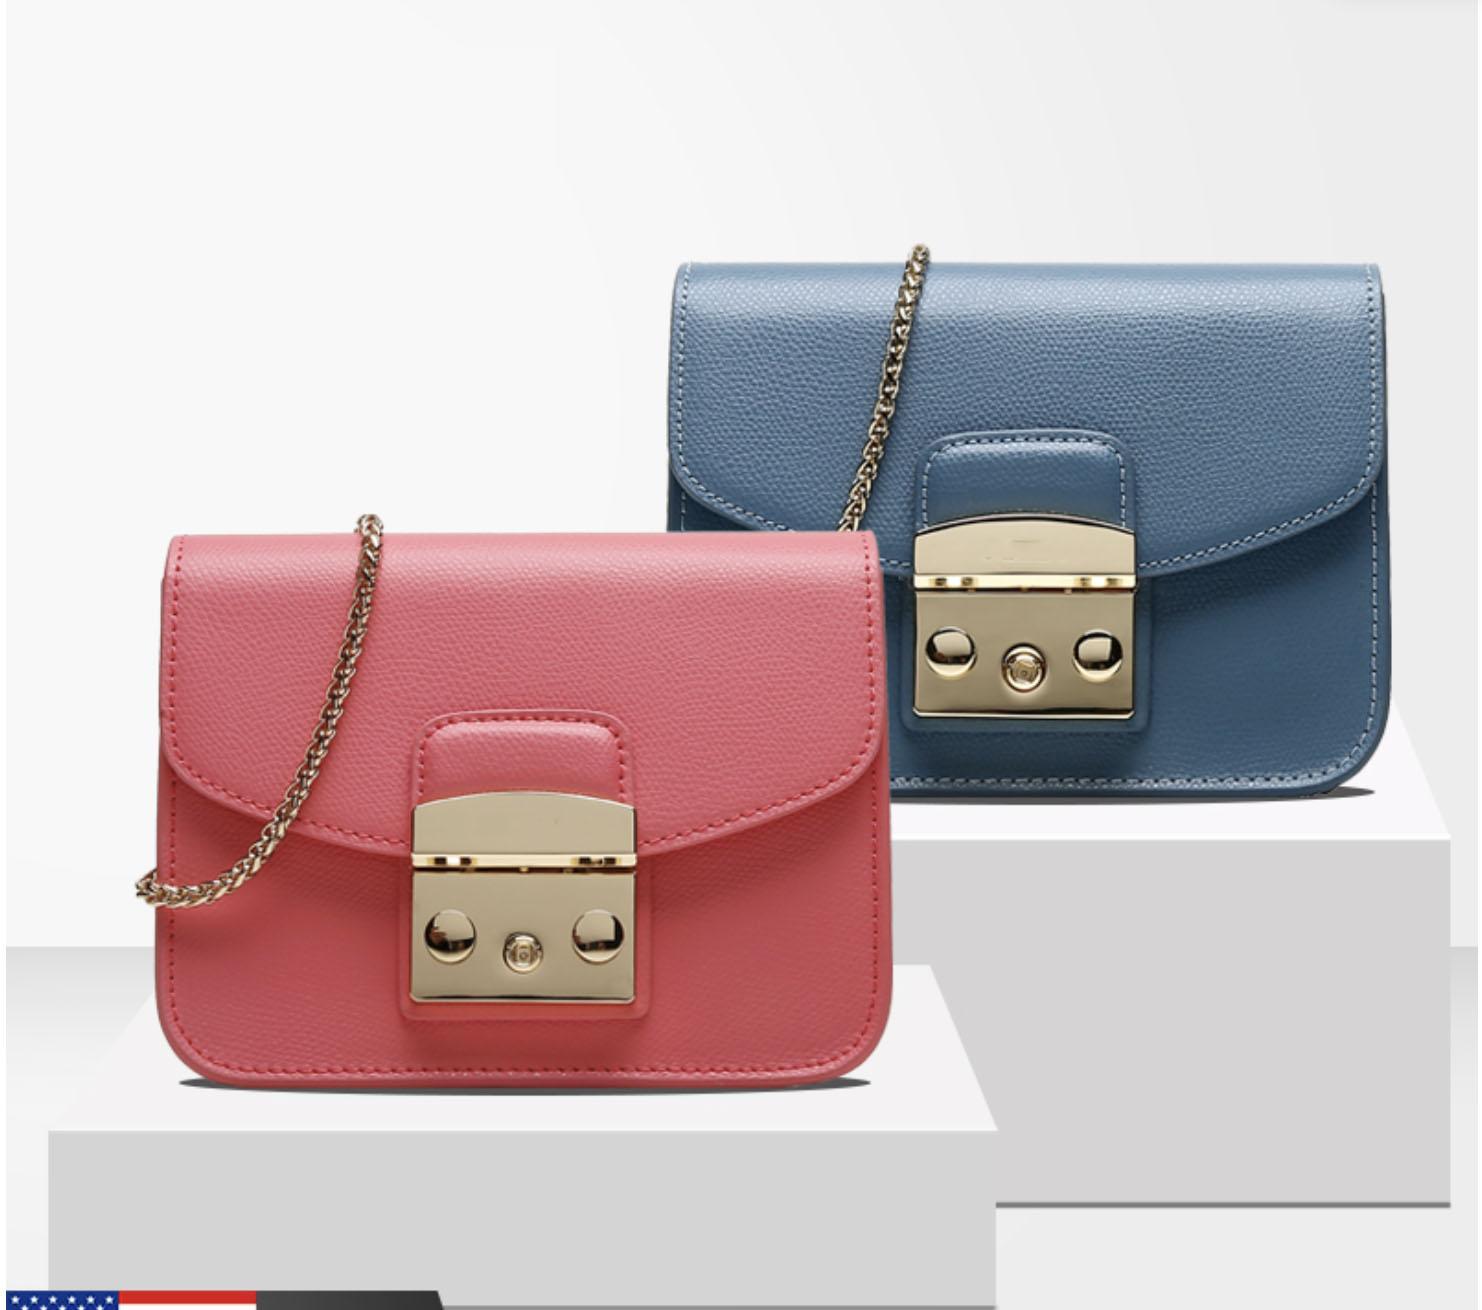 8d7baa9bf Hot Sale Women Bag Mini Metropolis Bag Ladies Leather Women Messenger Bags  Handbags Women Famous Brands Small Crossbody Bags Leather Purses Cheap  Designer ...